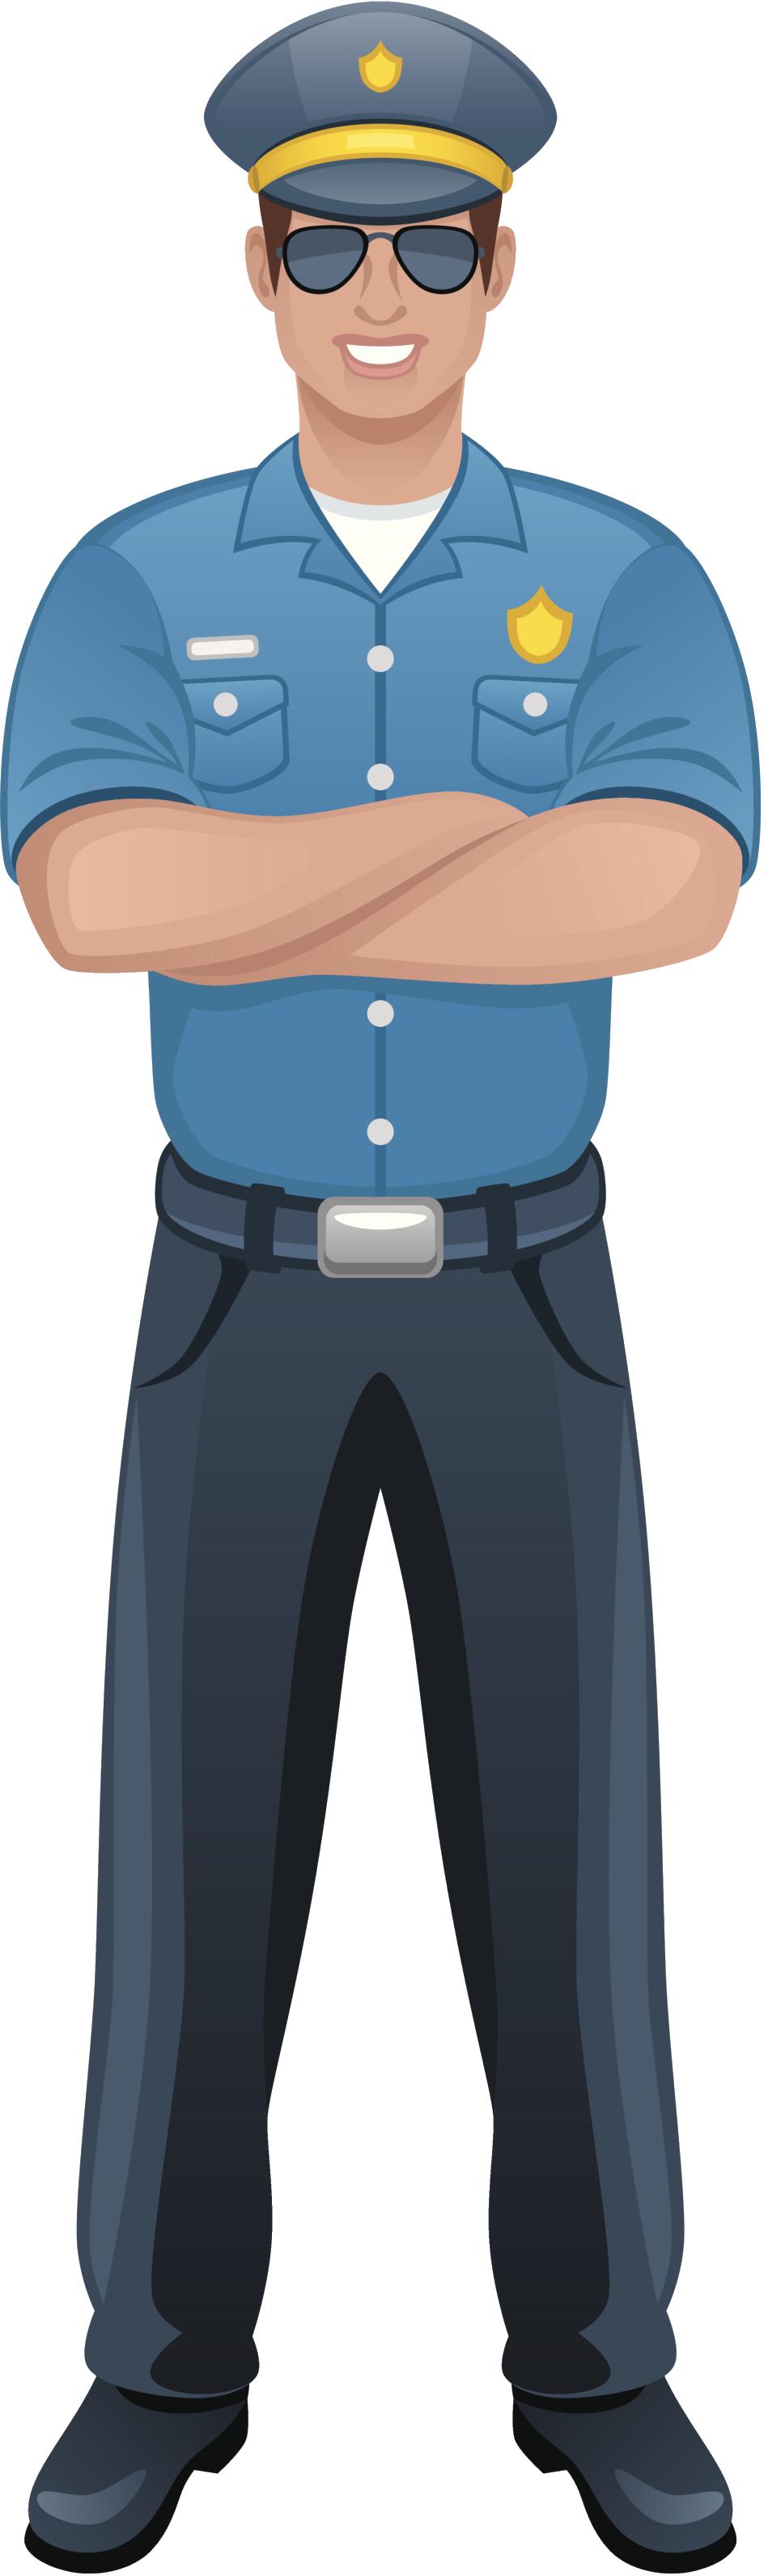 Clipart Policeman Clipartzo-Clipart policeman clipartzo-2